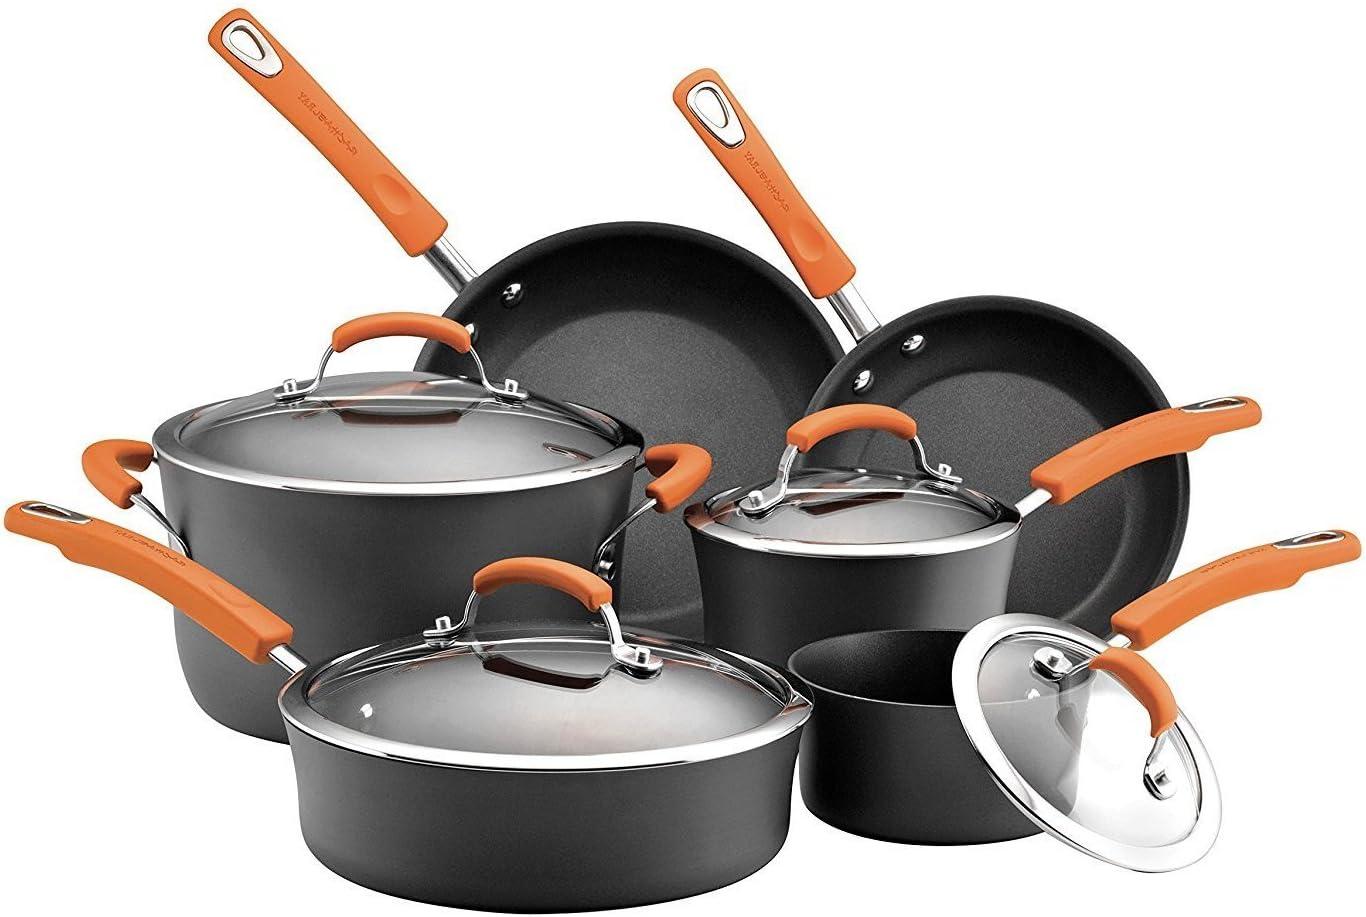 Amazon.com: Premium Cookware Set 7 Piece RACHAEL RAY Exquisite